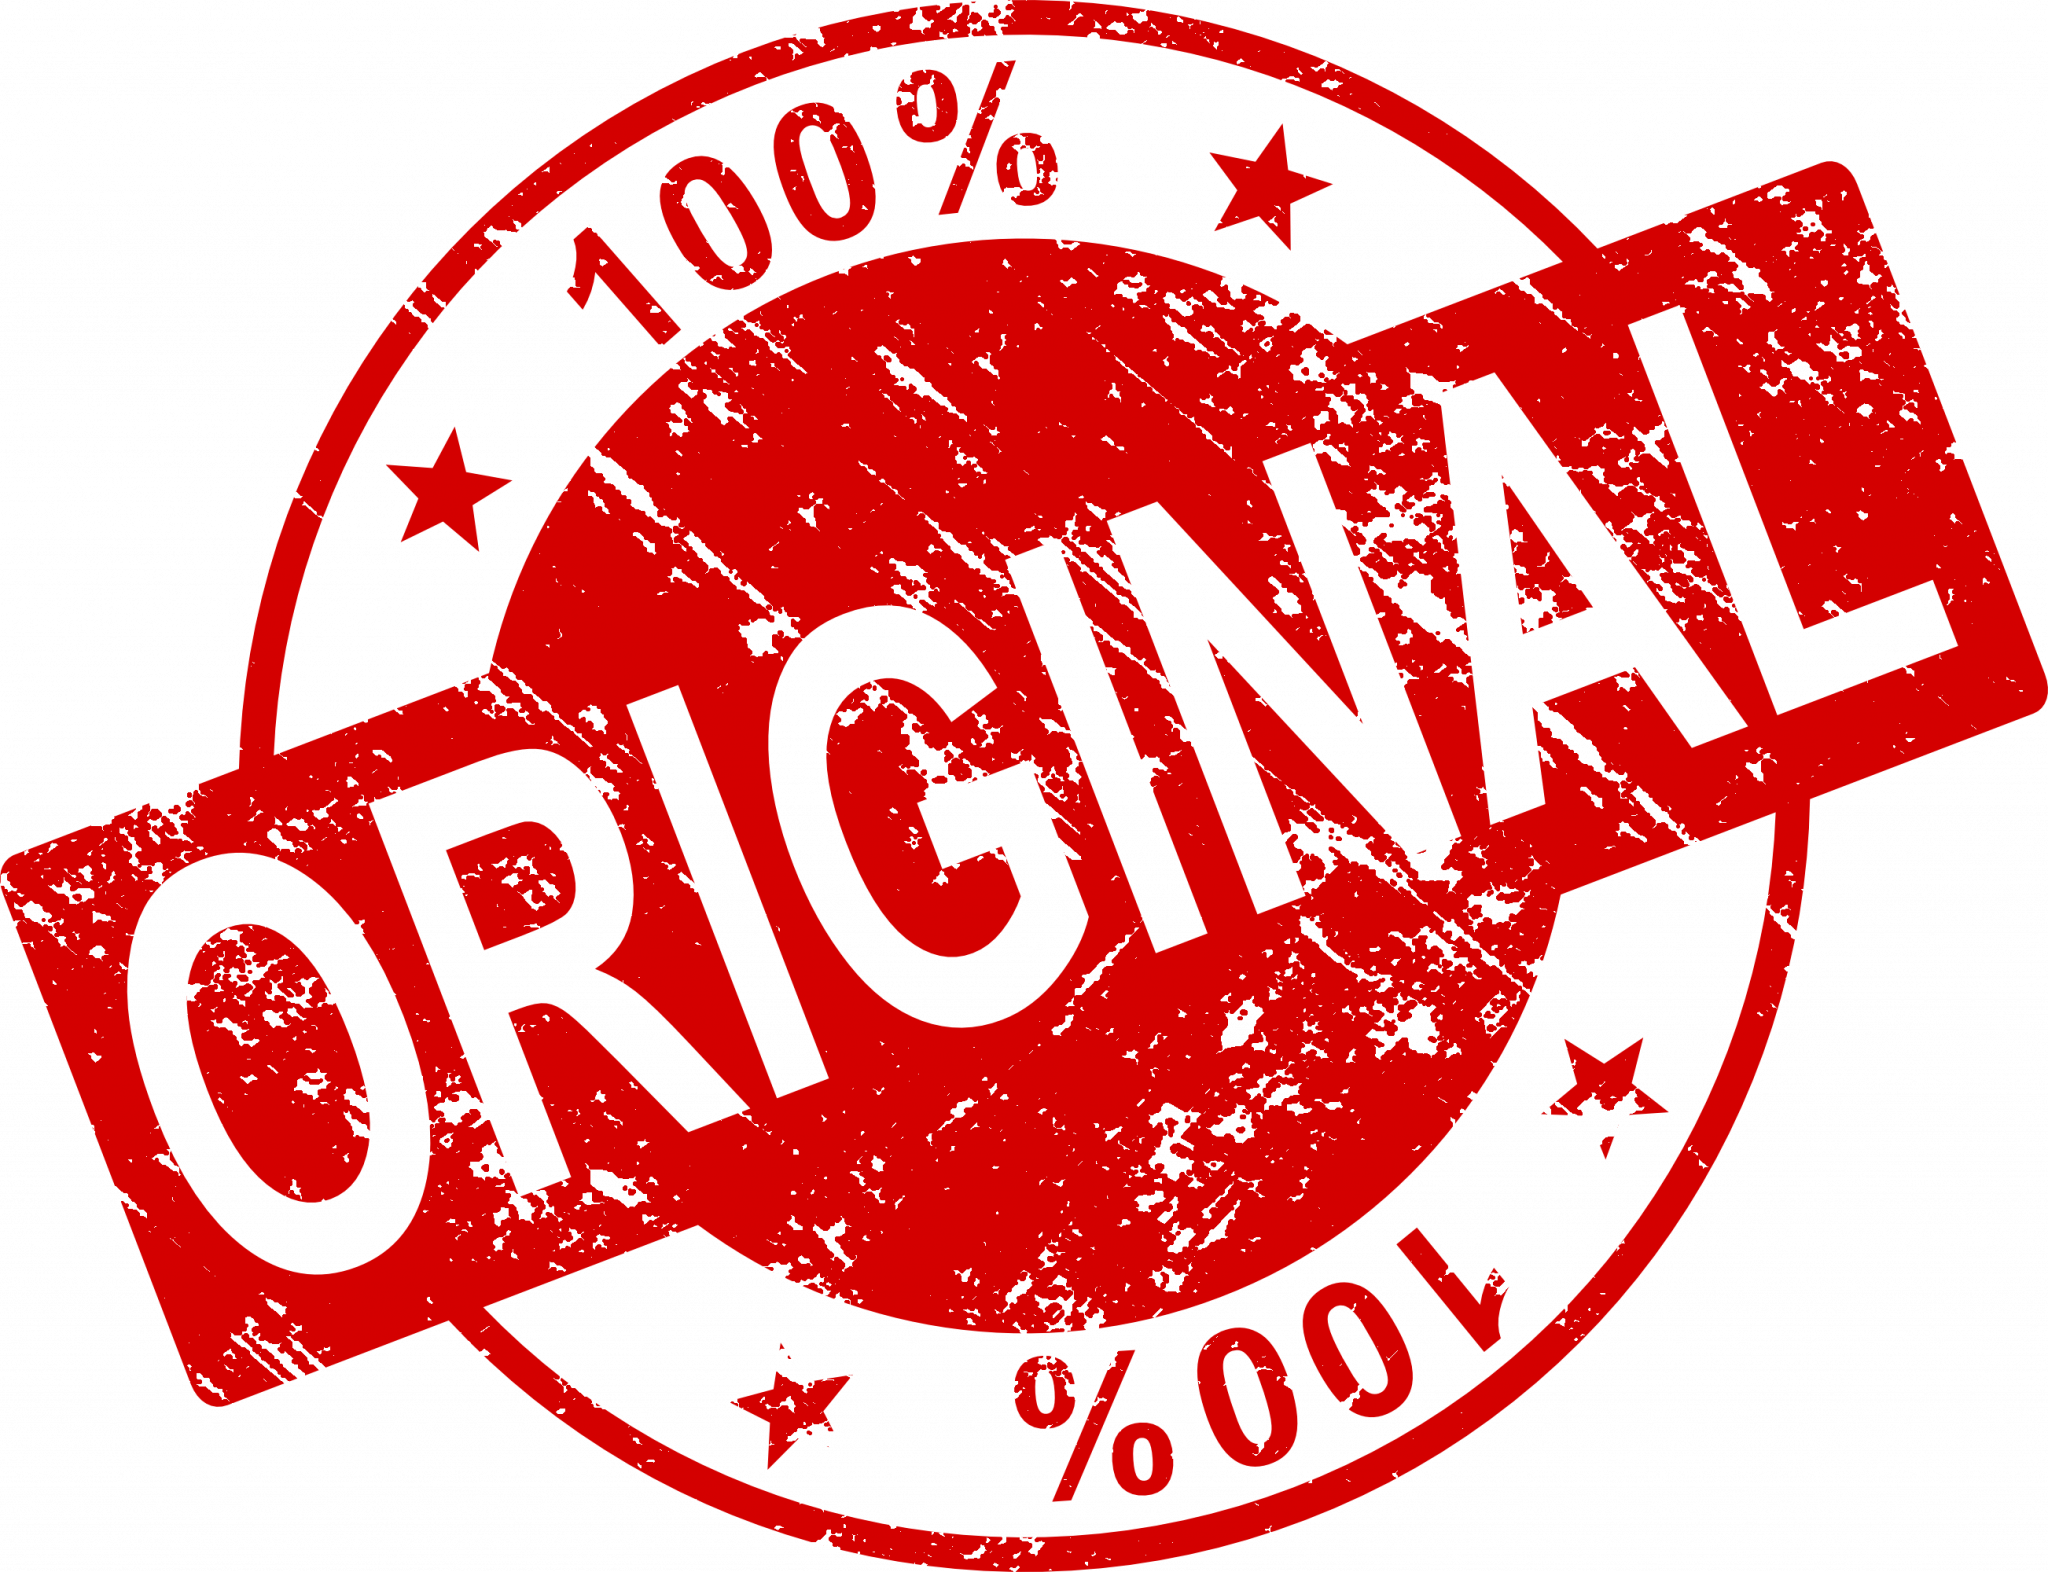 original-scaled.png